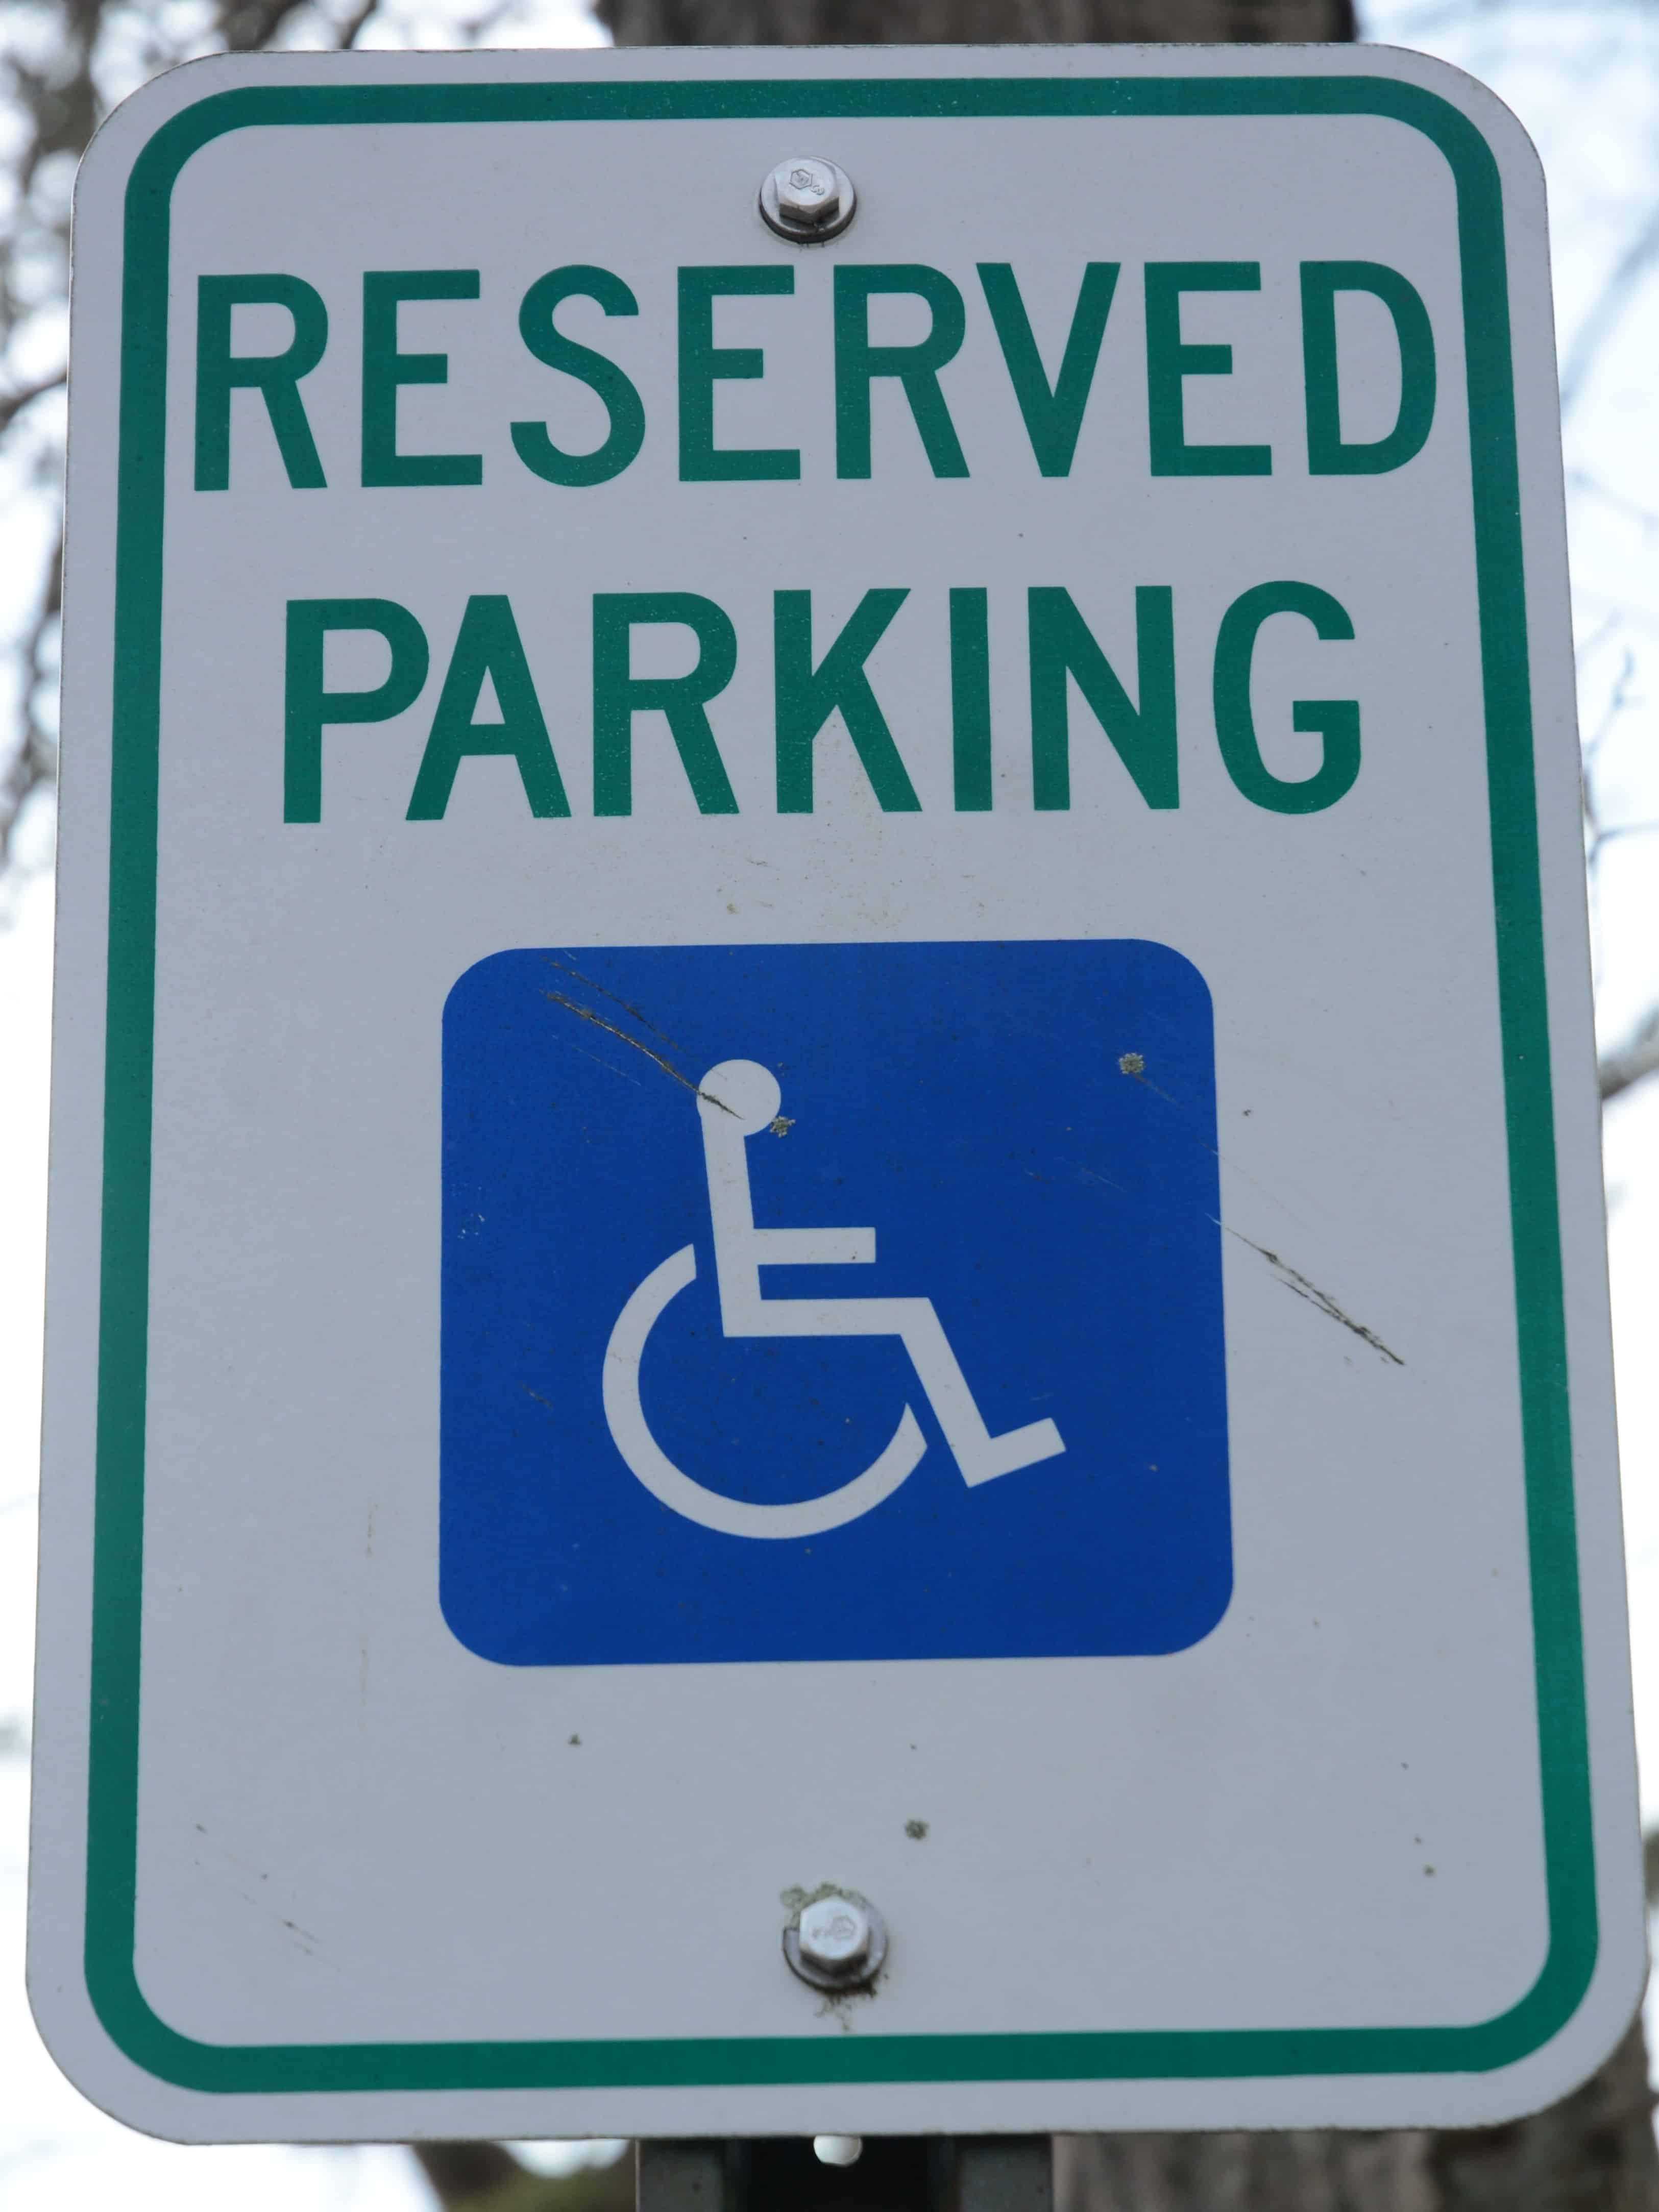 Parking Request